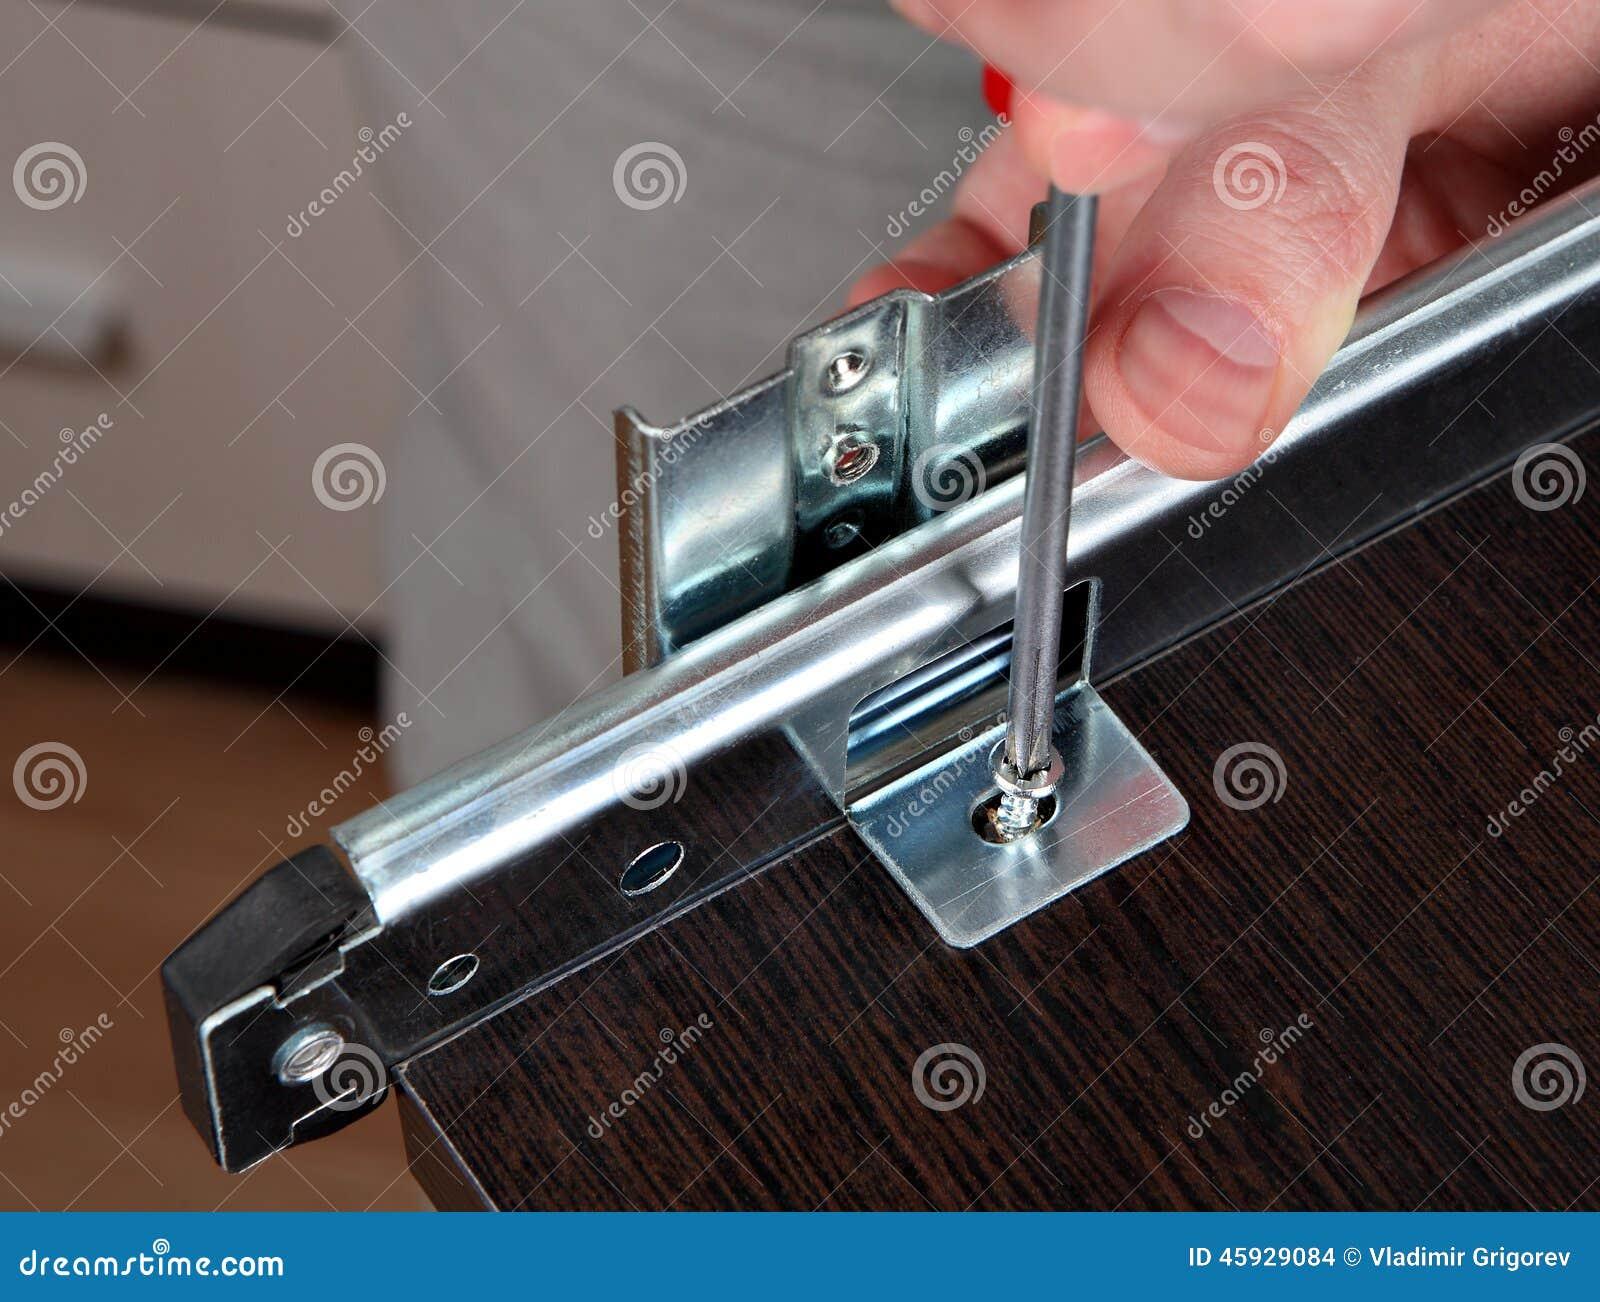 Fixing Drawers Installing Track Drawer Slide Rail Stock